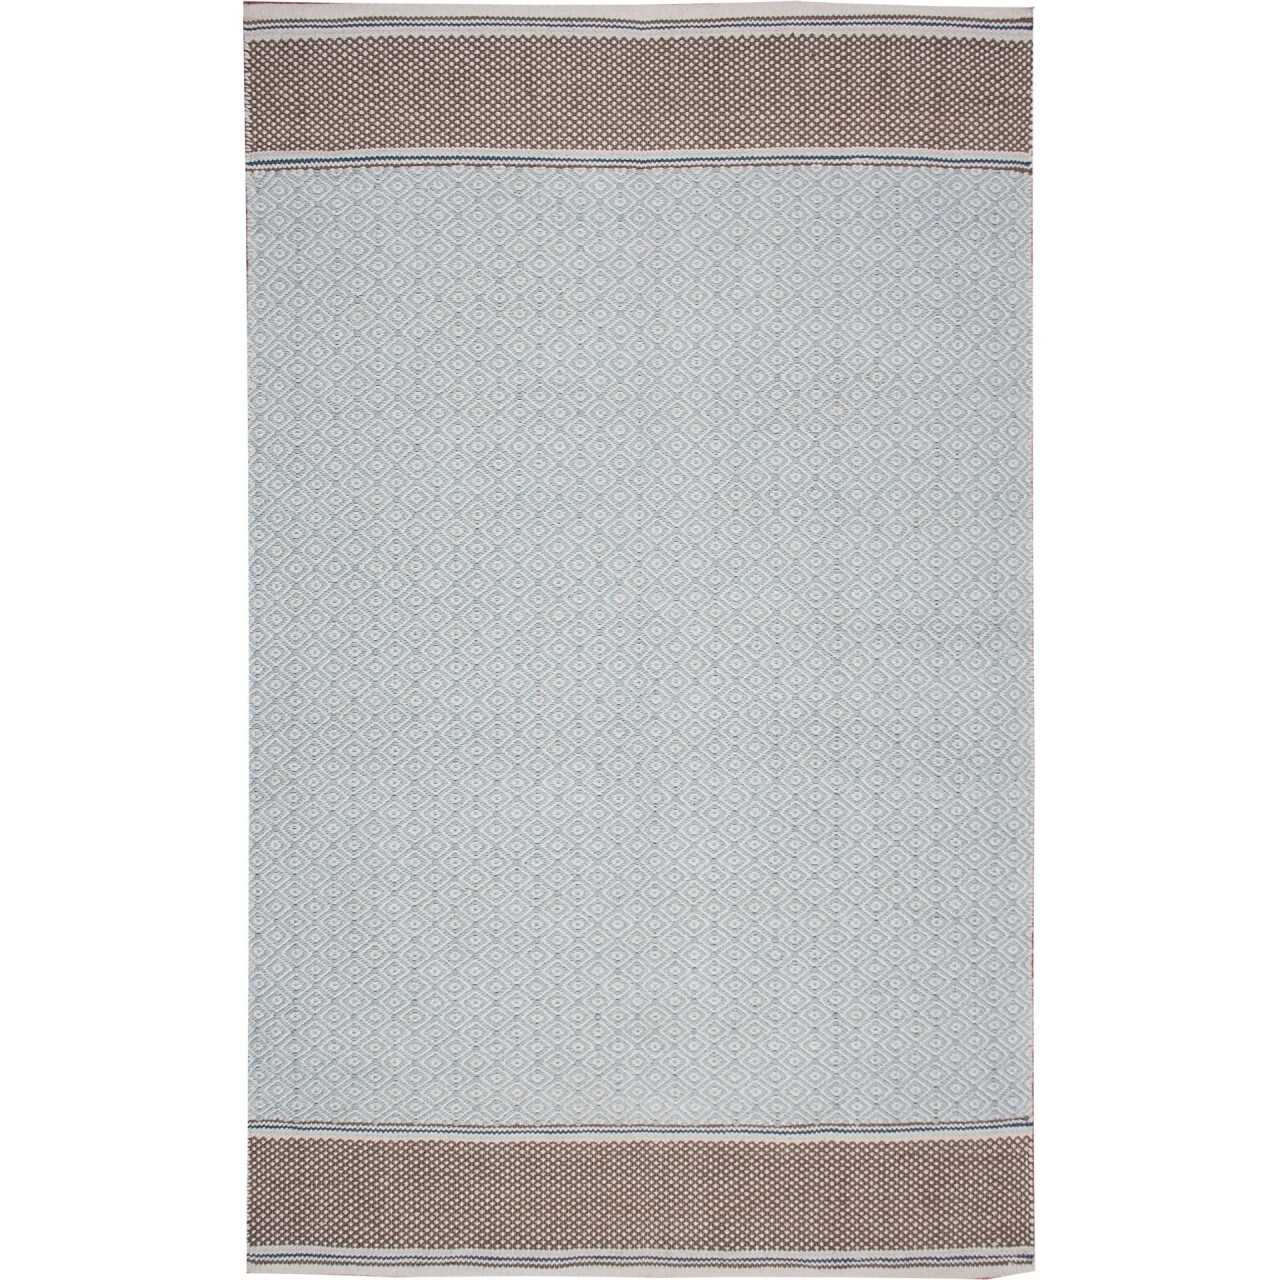 Covor rezistent Eko, 9027 - Blue, Grey, 100% bumbac,  120 x 180 cm